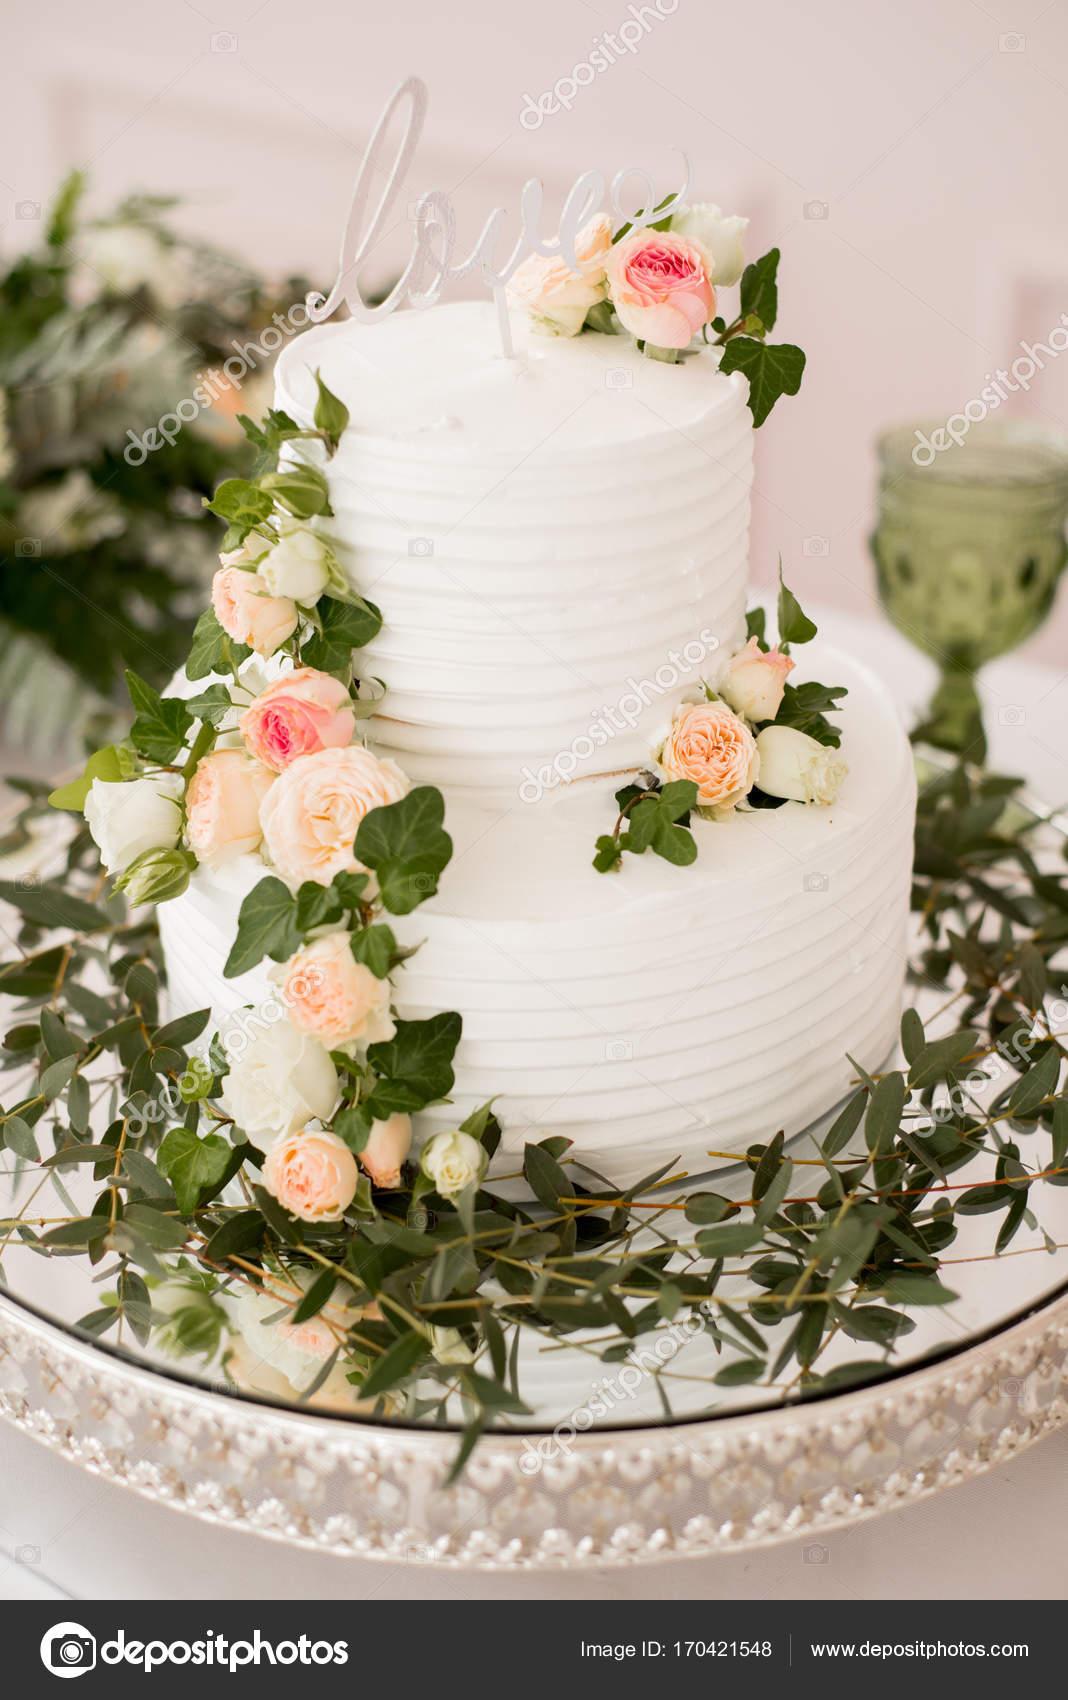 A wedding cake. Table setting. Bridal bouquet. & A wedding cake. Table setting. Bridal bouquet. \u2014 Stock Photo ...